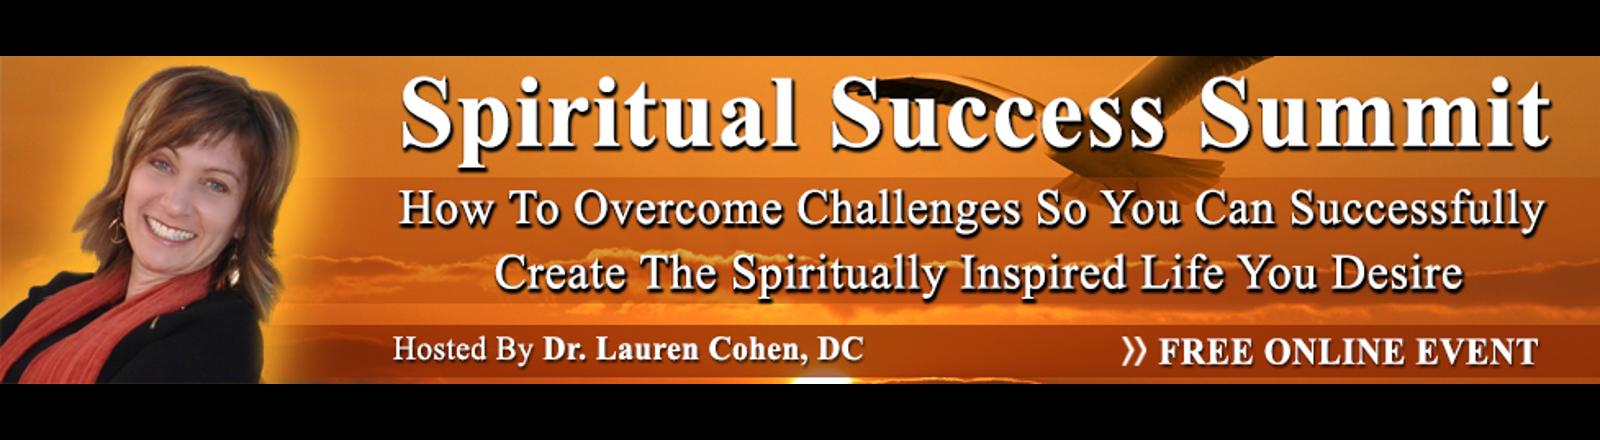 spiritual-stree-free-summit